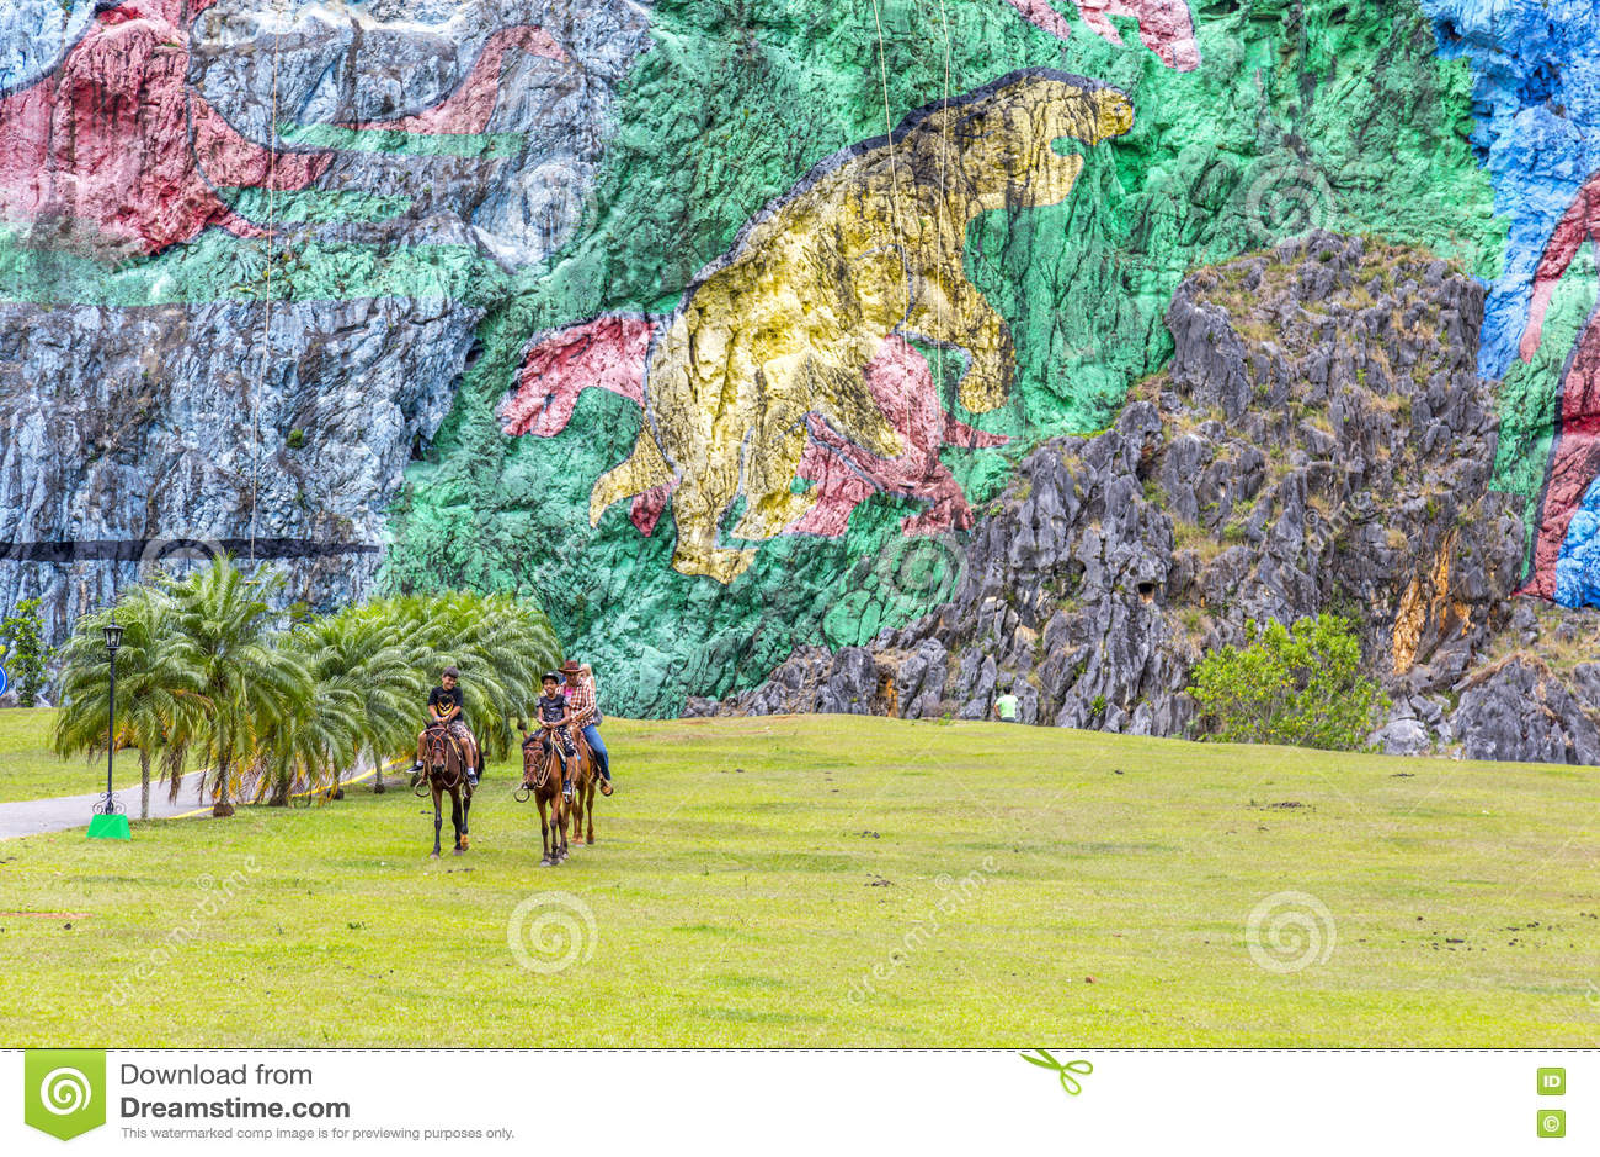 Prehistory wall in vinales cuba stock photography for Mural de la prehistoria